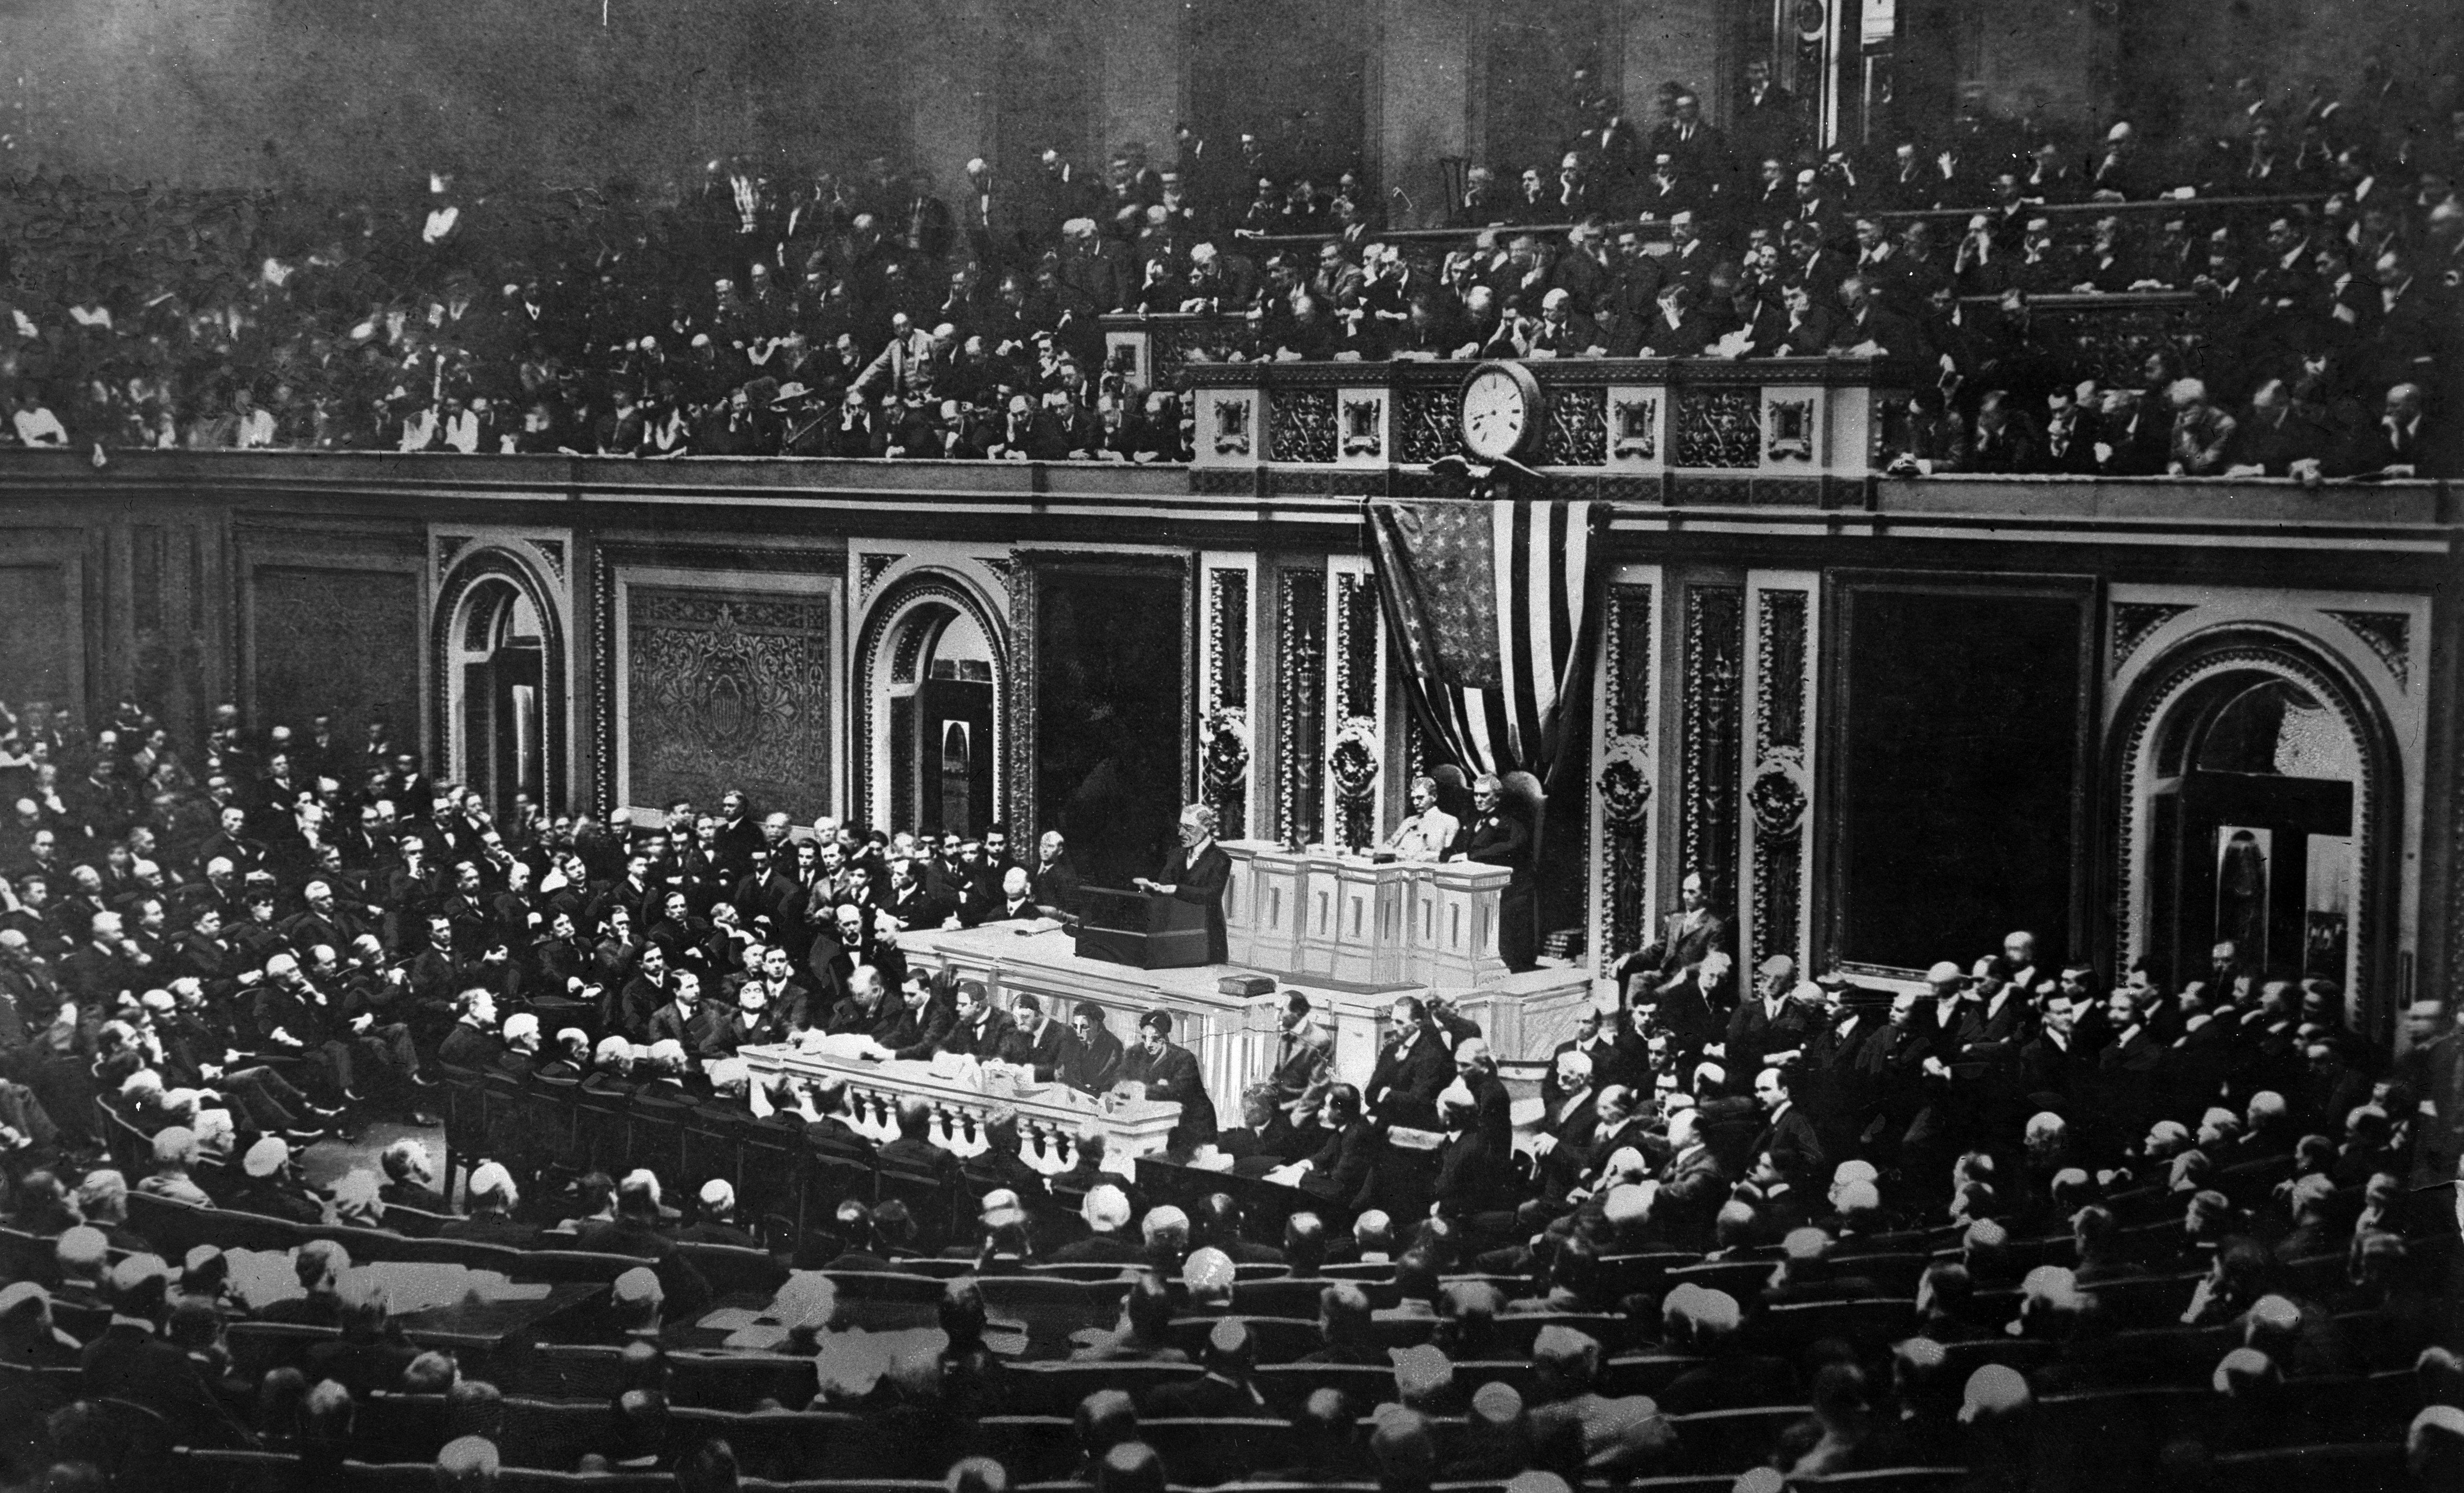 woodrow wilson s speech analyzed speech given april 2 1917